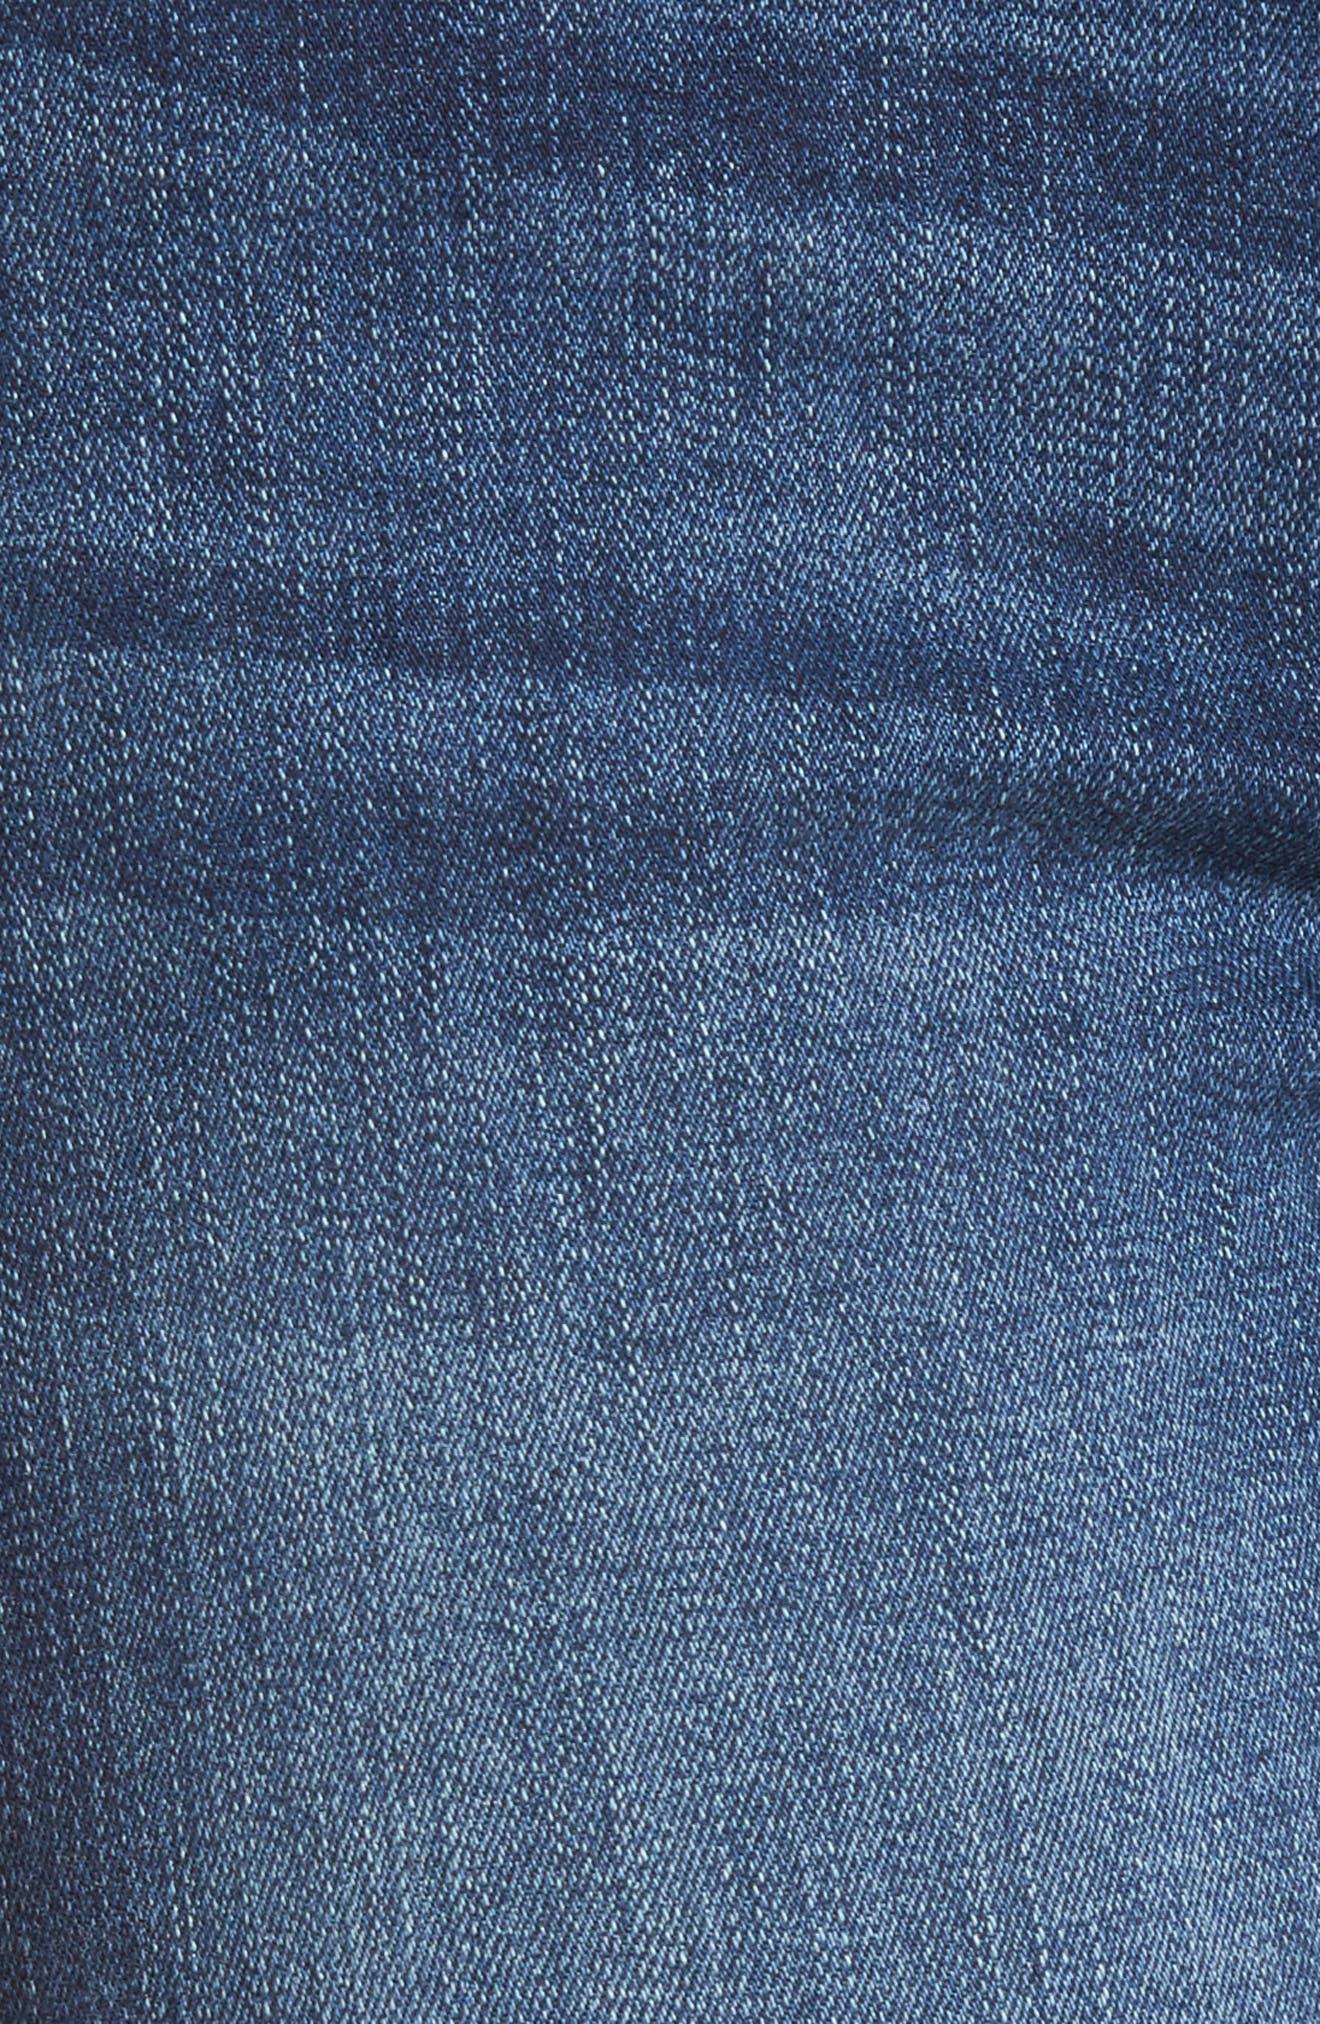 Emma Power Legging Jeans,                             Alternate thumbnail 6, color,                             425